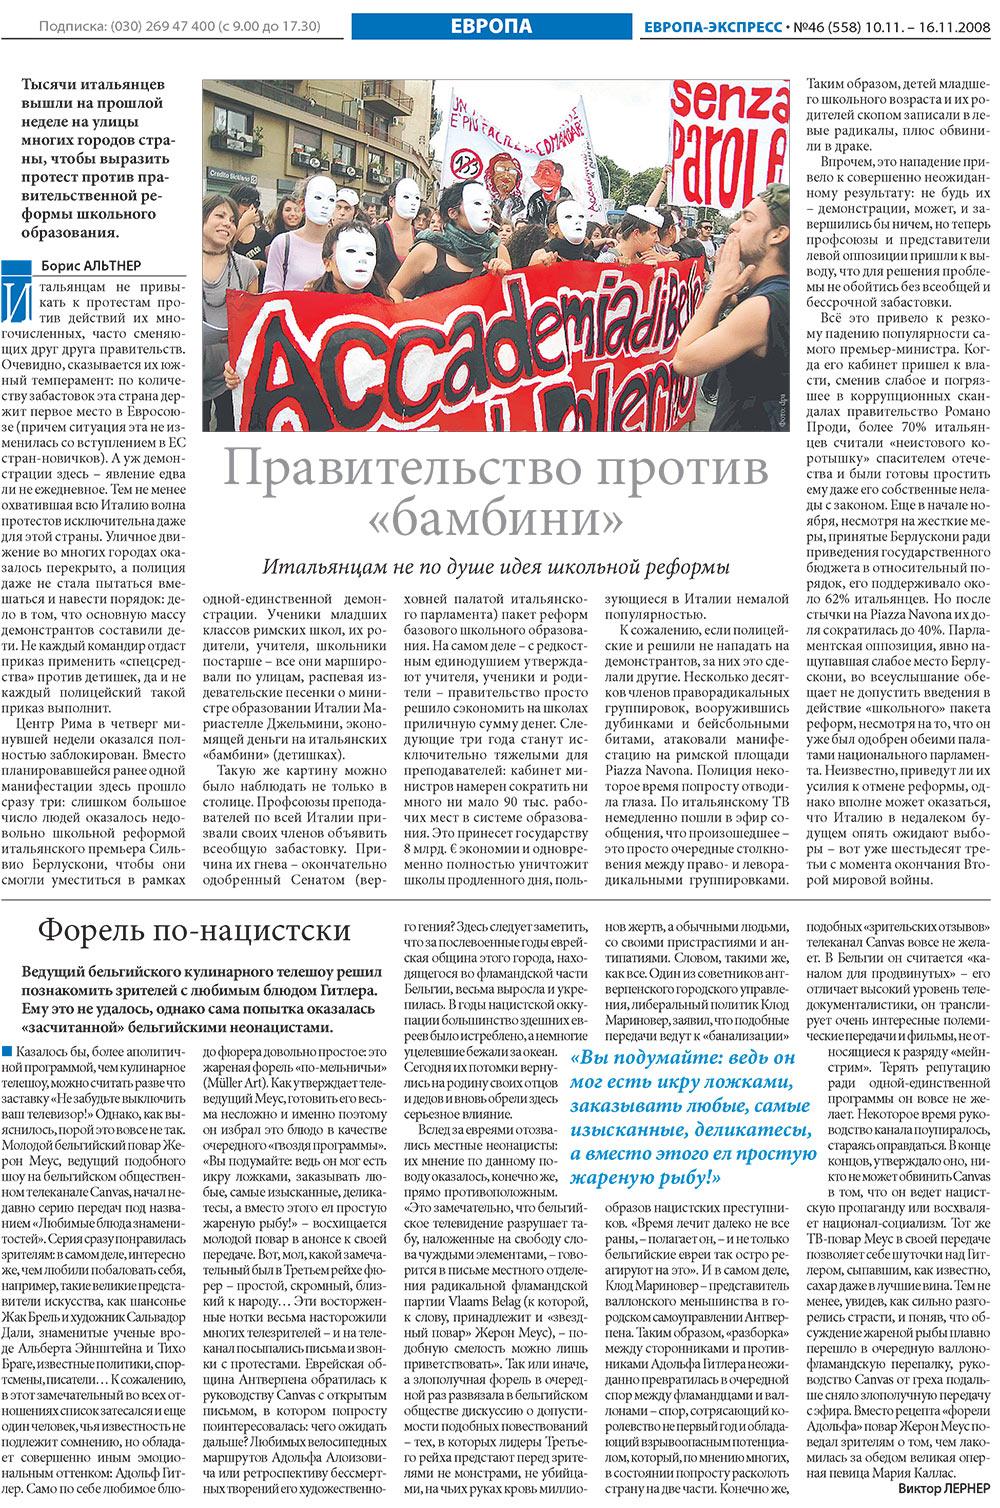 Европа экспресс (газета). 2008 год, номер 46, стр. 10